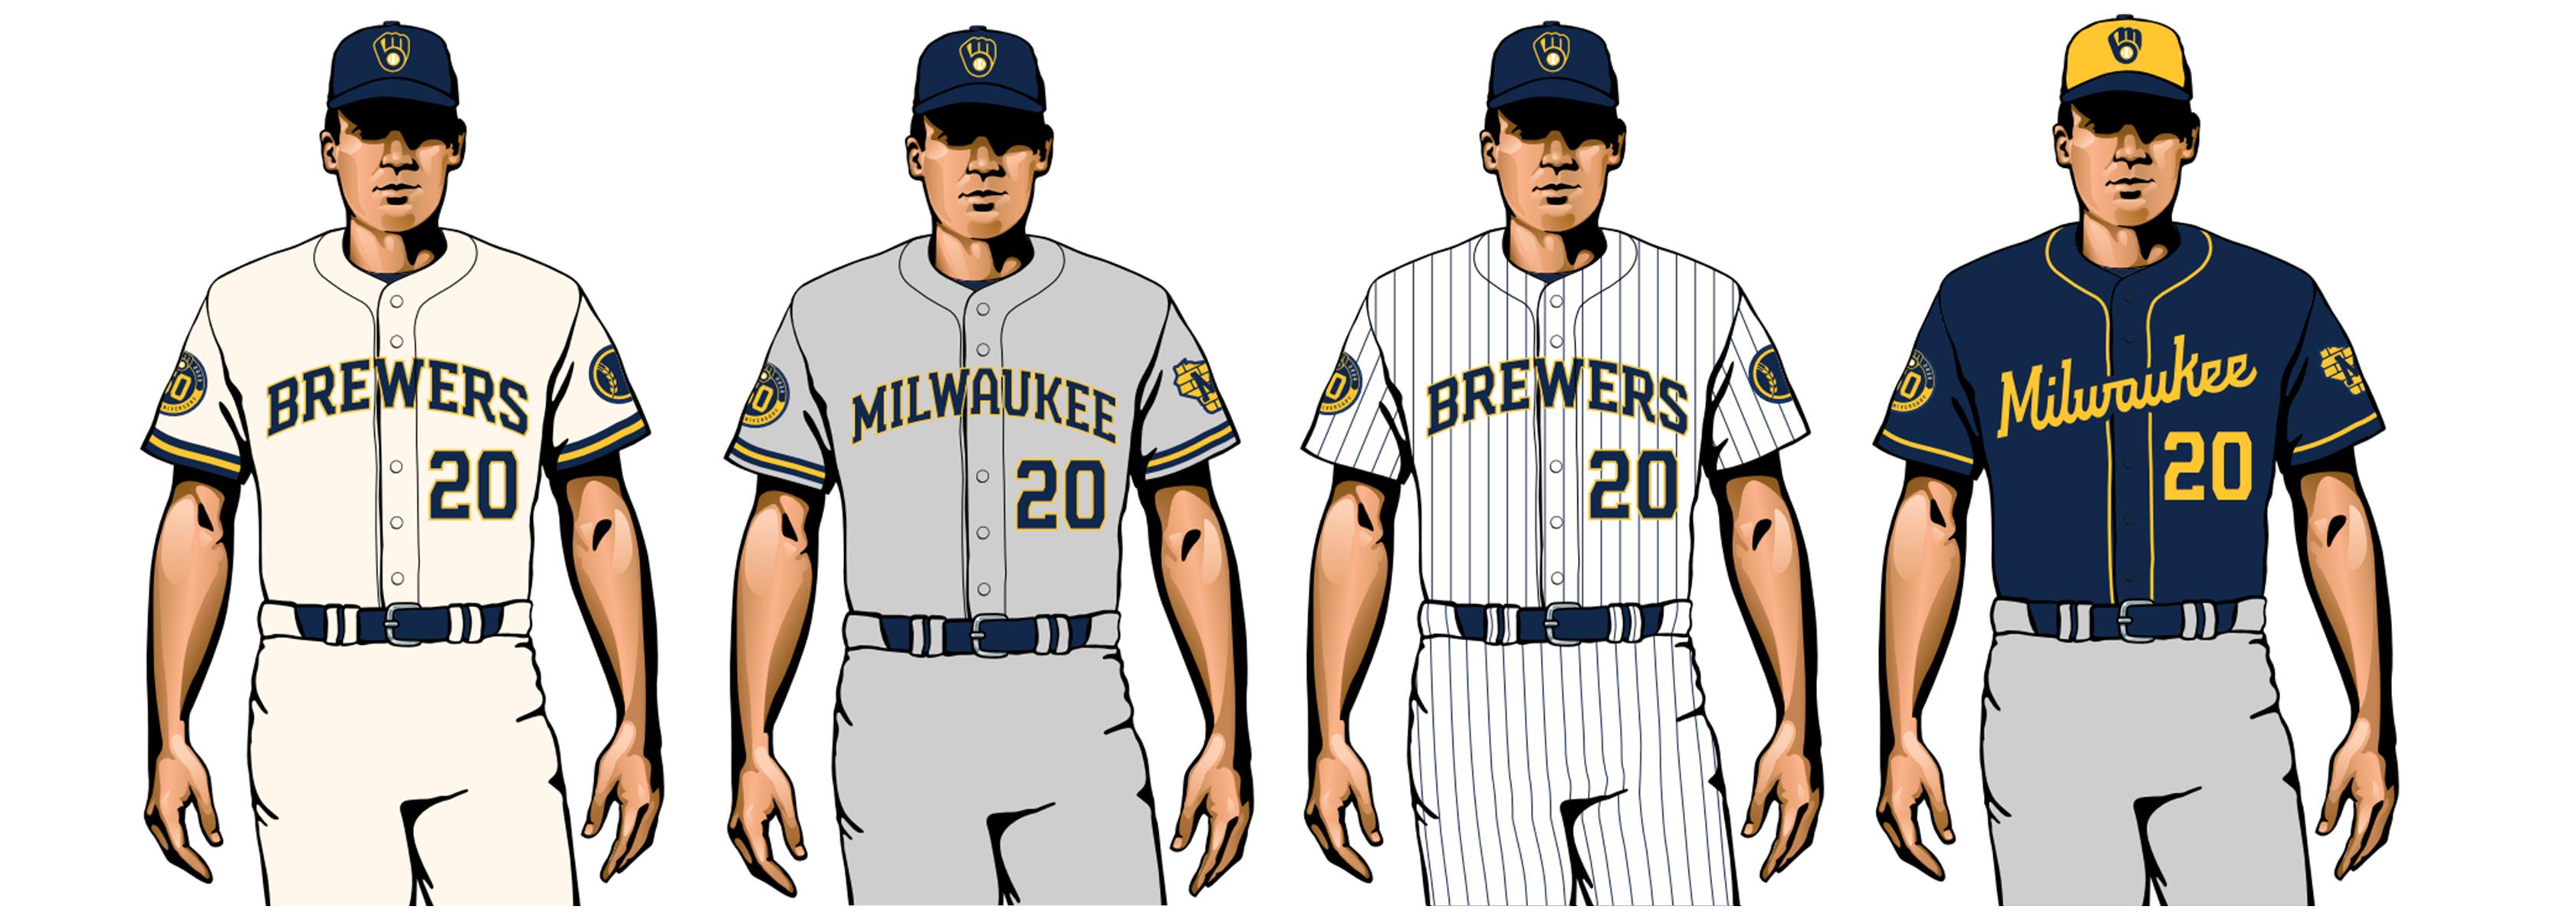 milwaukee brewers 2020 uniformes